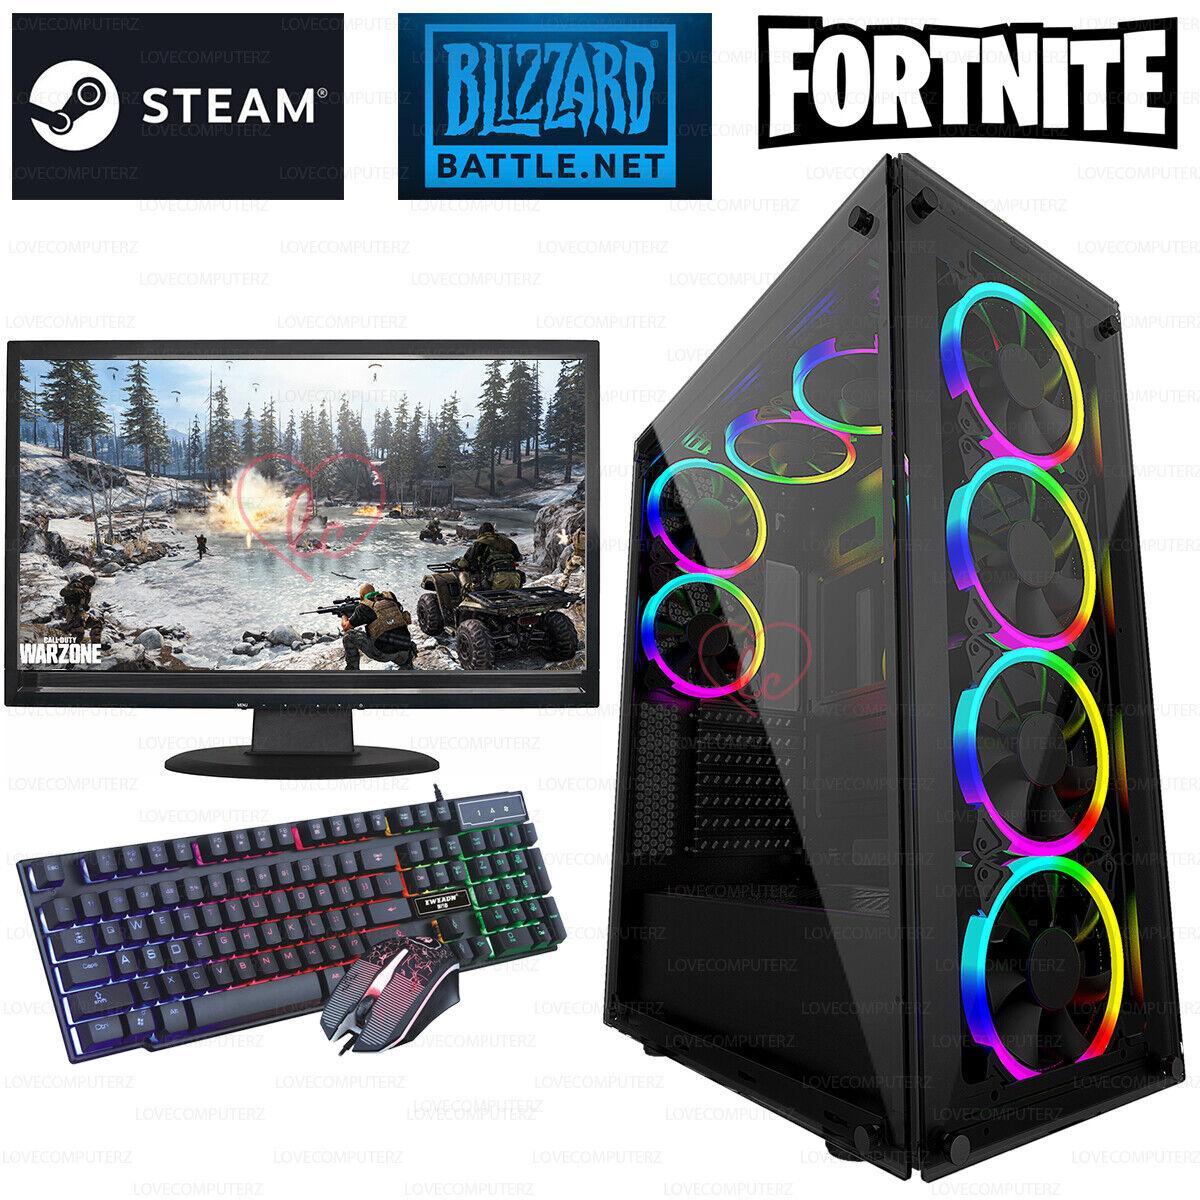 Computer Games - FAST Intel Core i7 Gaming PC Computer 16GB RAM 1TB HDD Windows 10 GT 710 2GB